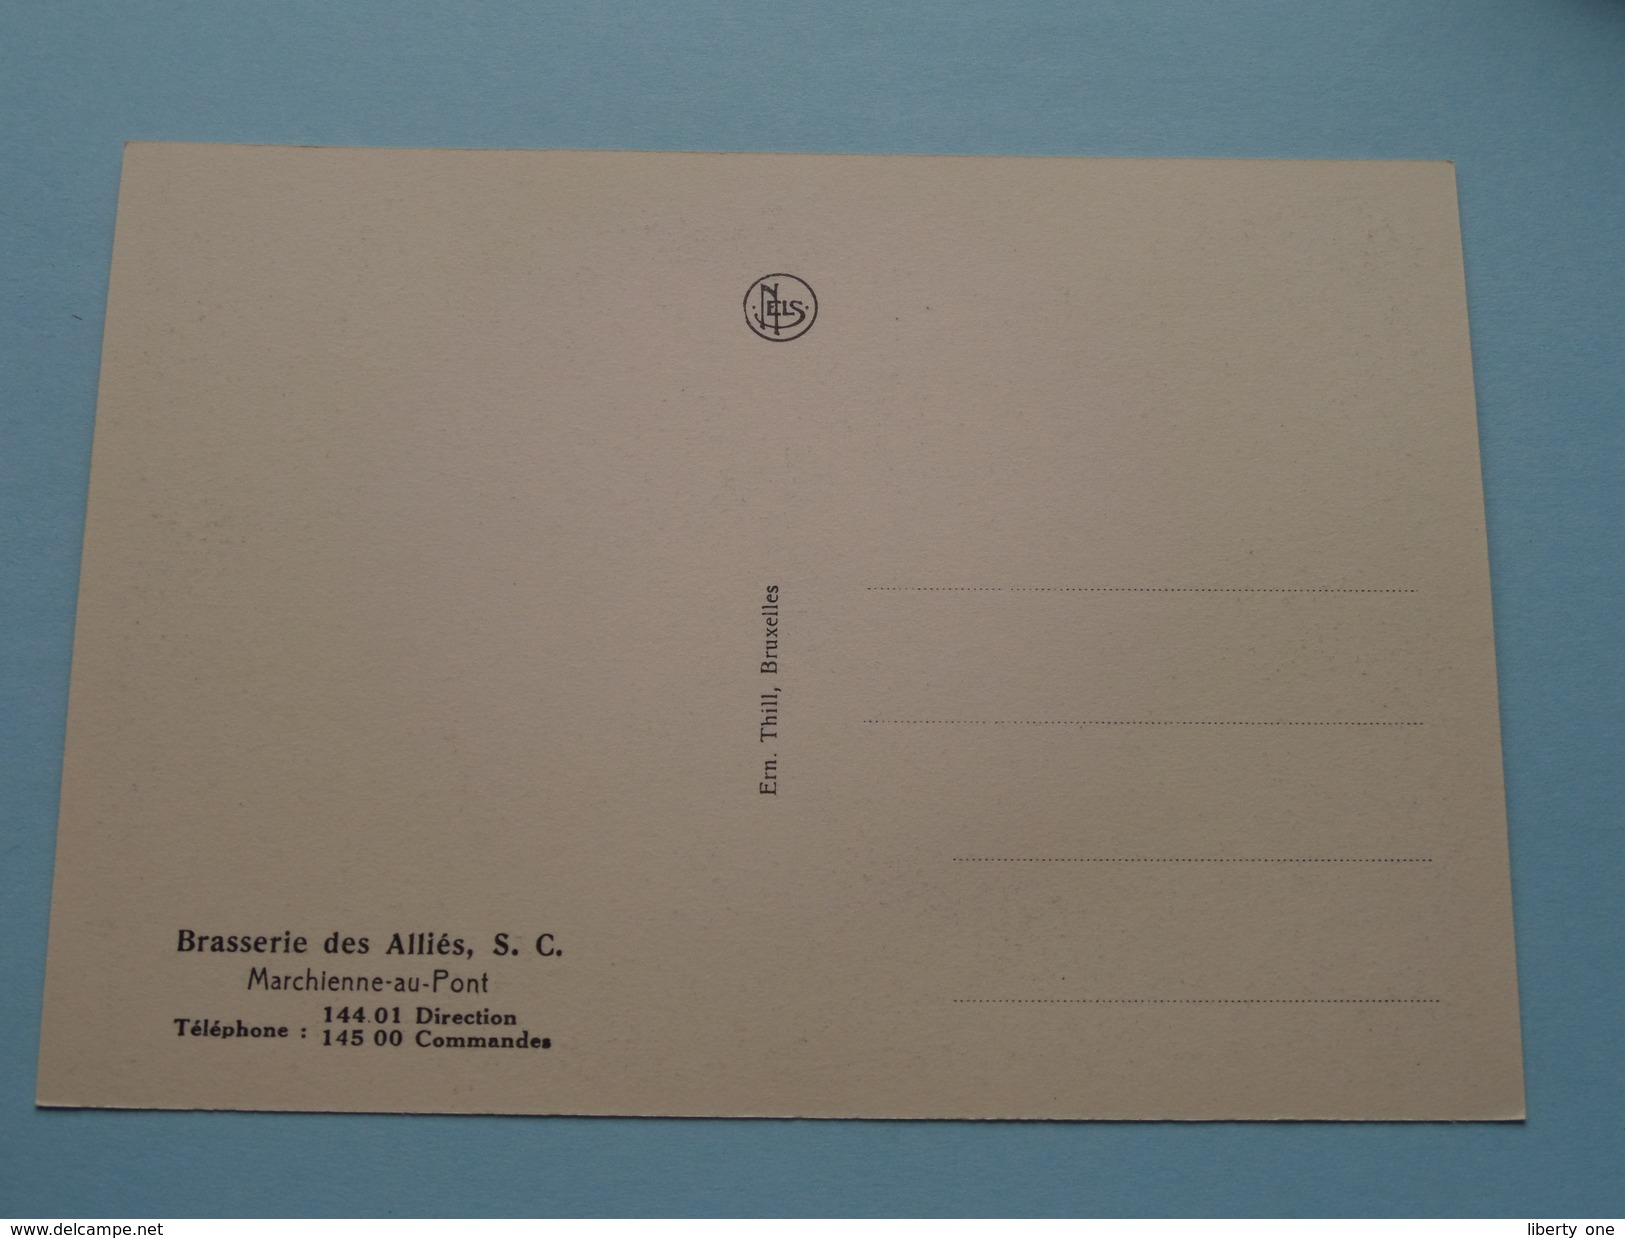 Brasserie Des Alliès, S. C. Tél 144.01 (Refrigerants) Marchienne-au-Pont - Anno 19?? ( Zie Foto Voor Details ) !! - Charleroi